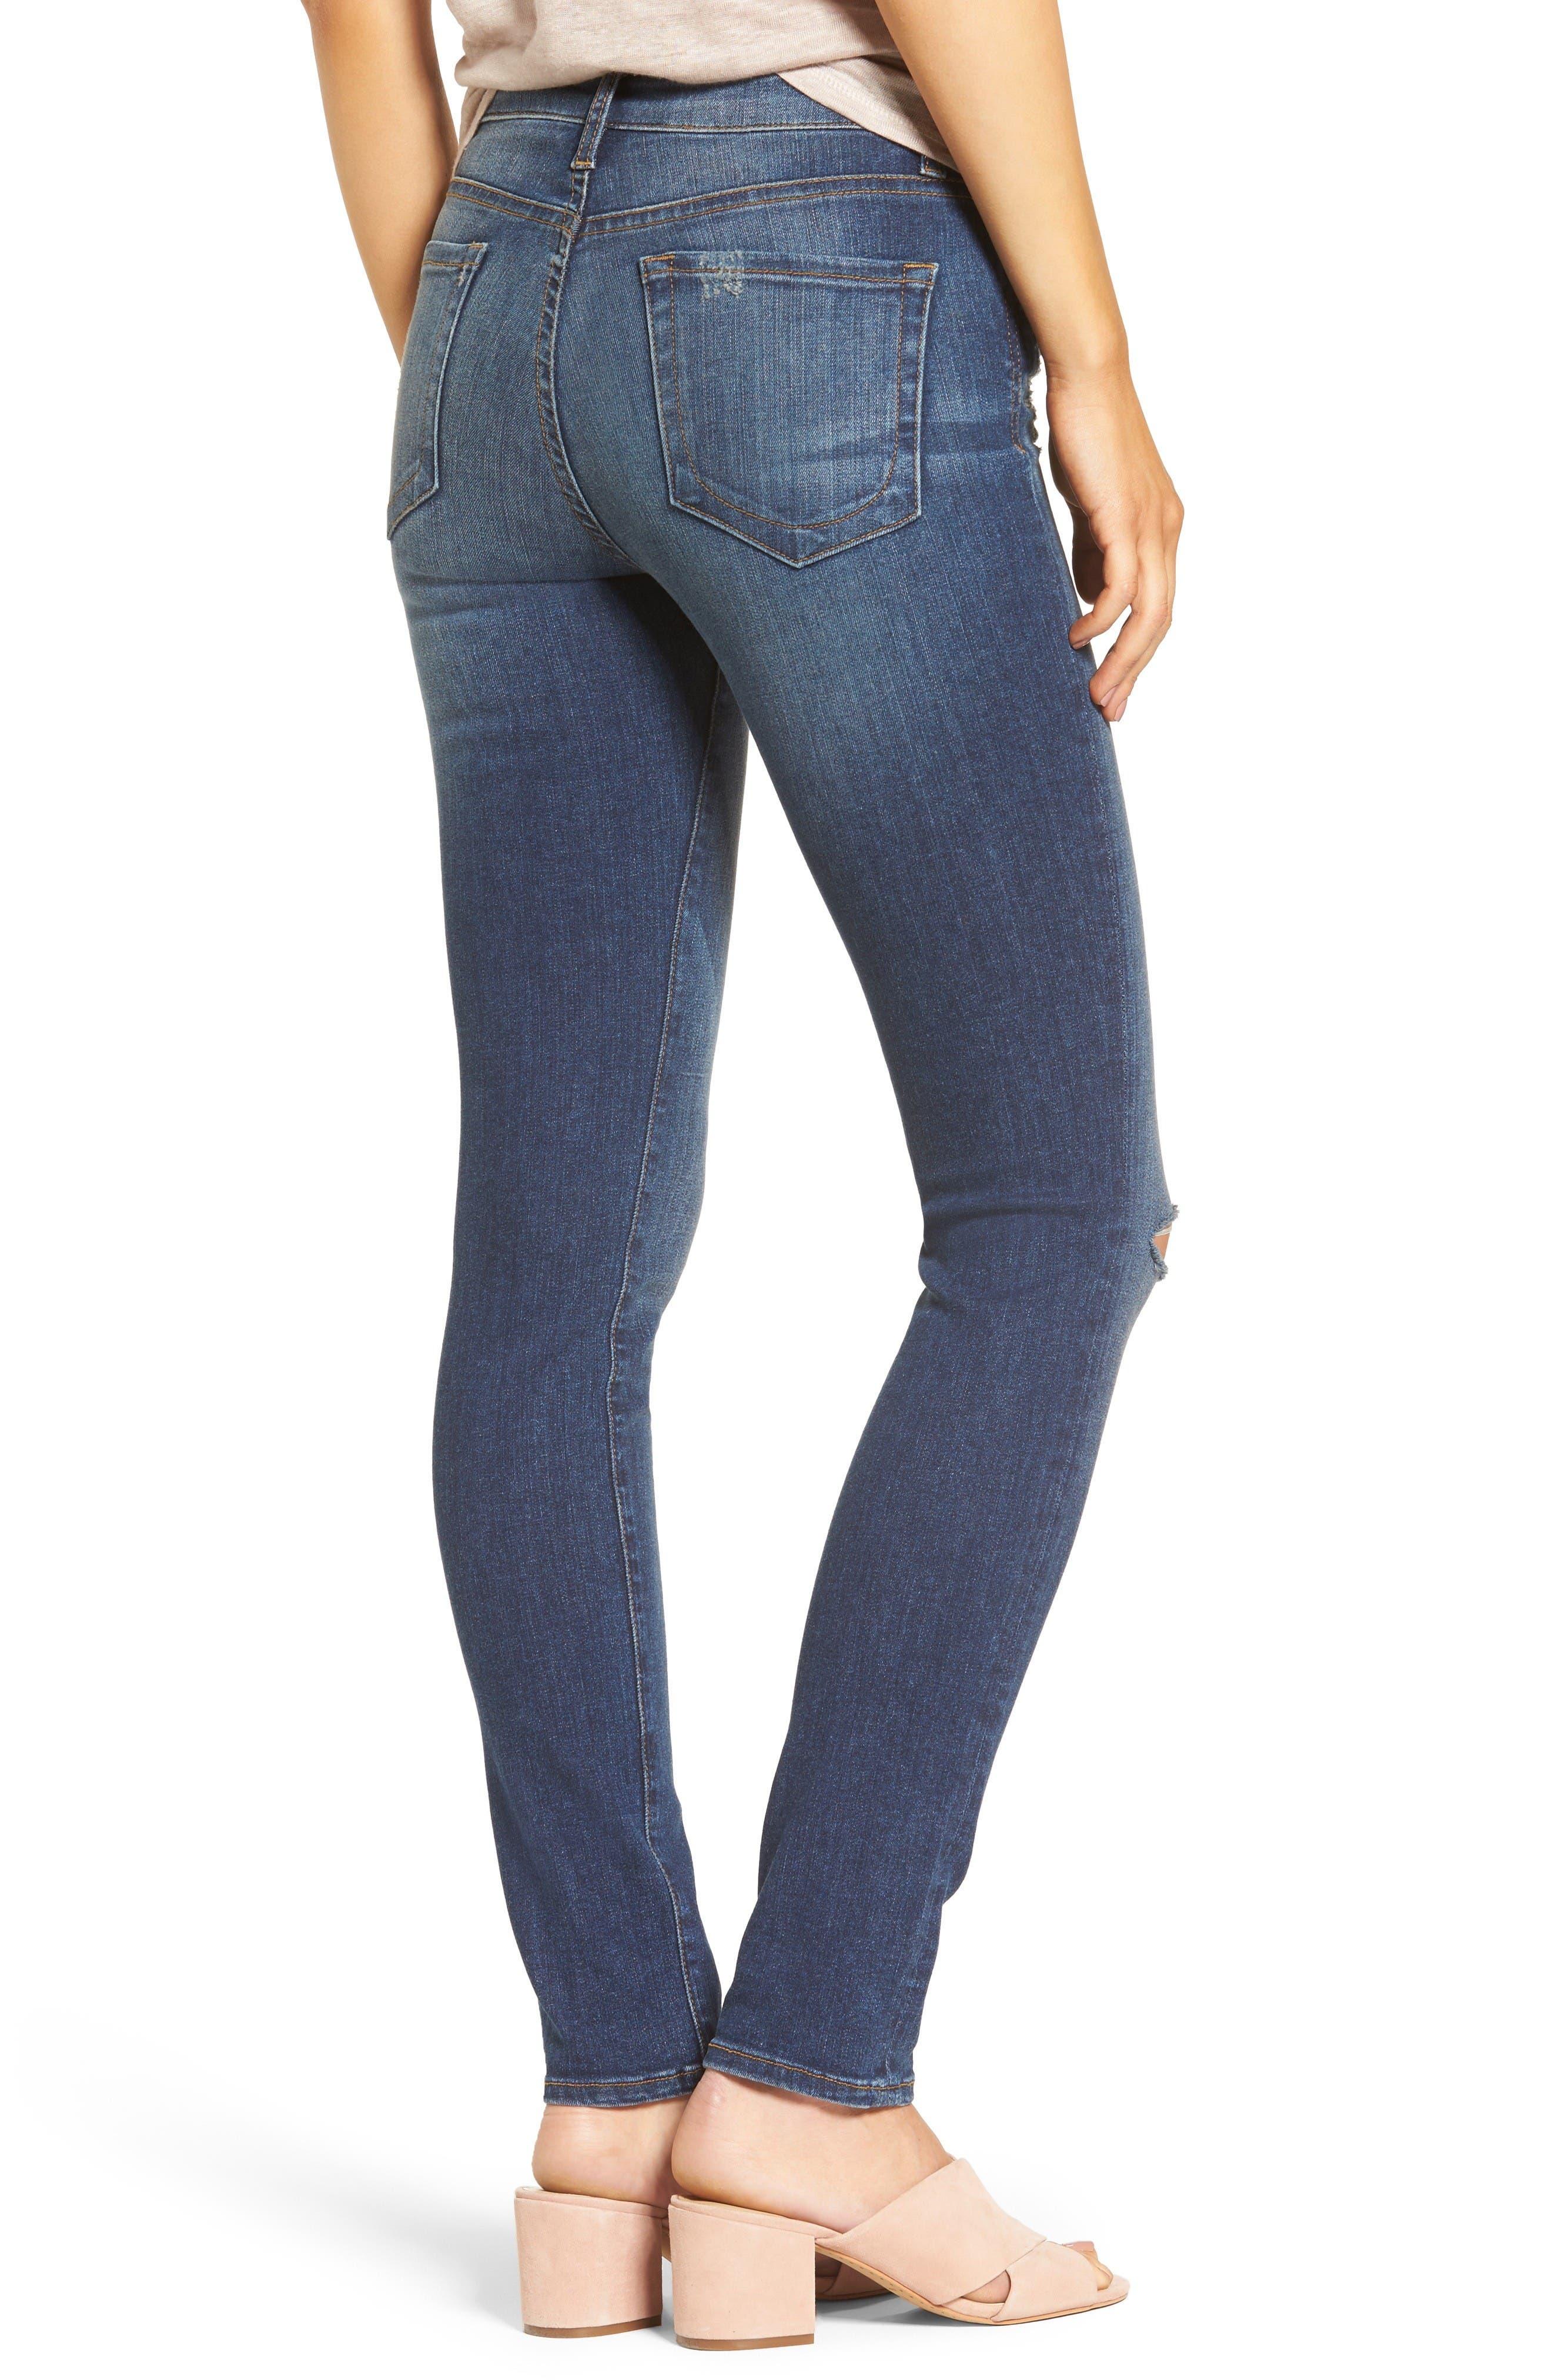 Alternate Image 3  - KUT from the Kloth Diana Ripped Stretch Skinny Jeans (Valorous) (Regular & Petite)